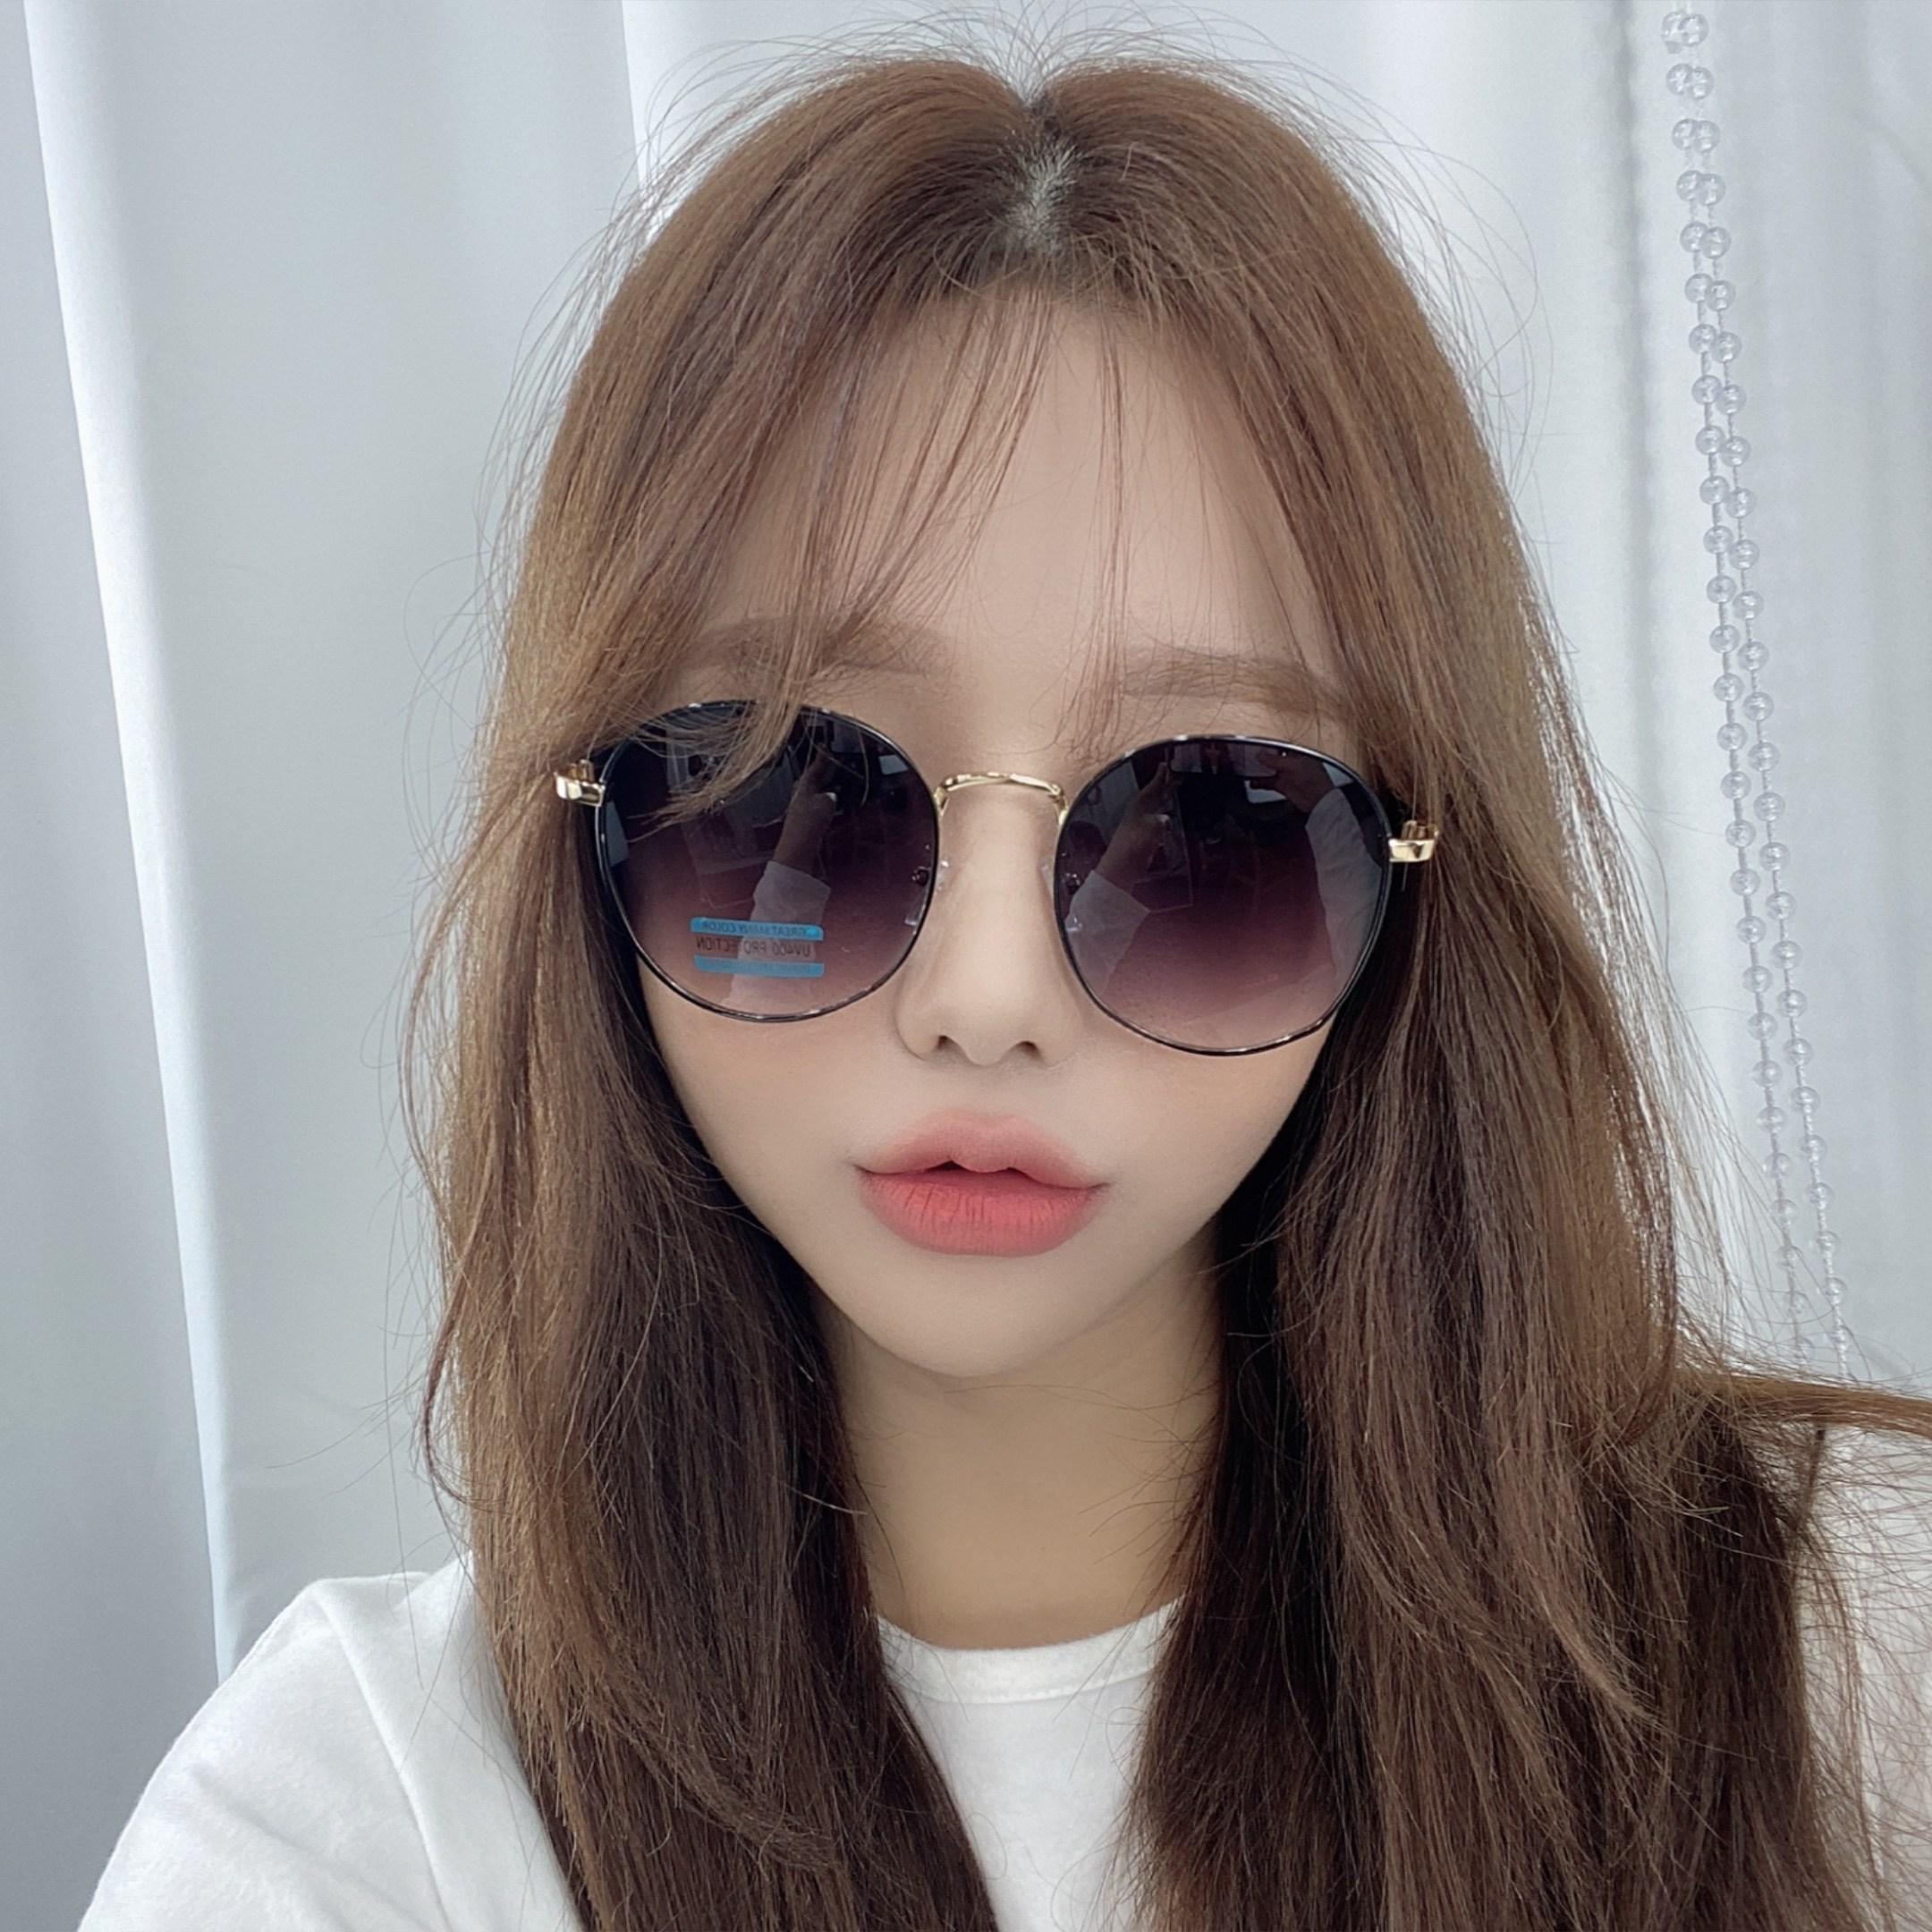 VANANA2 여성 남성 여름 선글라스 패션 미러 틴트 자외선차단 메탈테 여자 바캉스 남자 보잉 휴양지 썬글라스